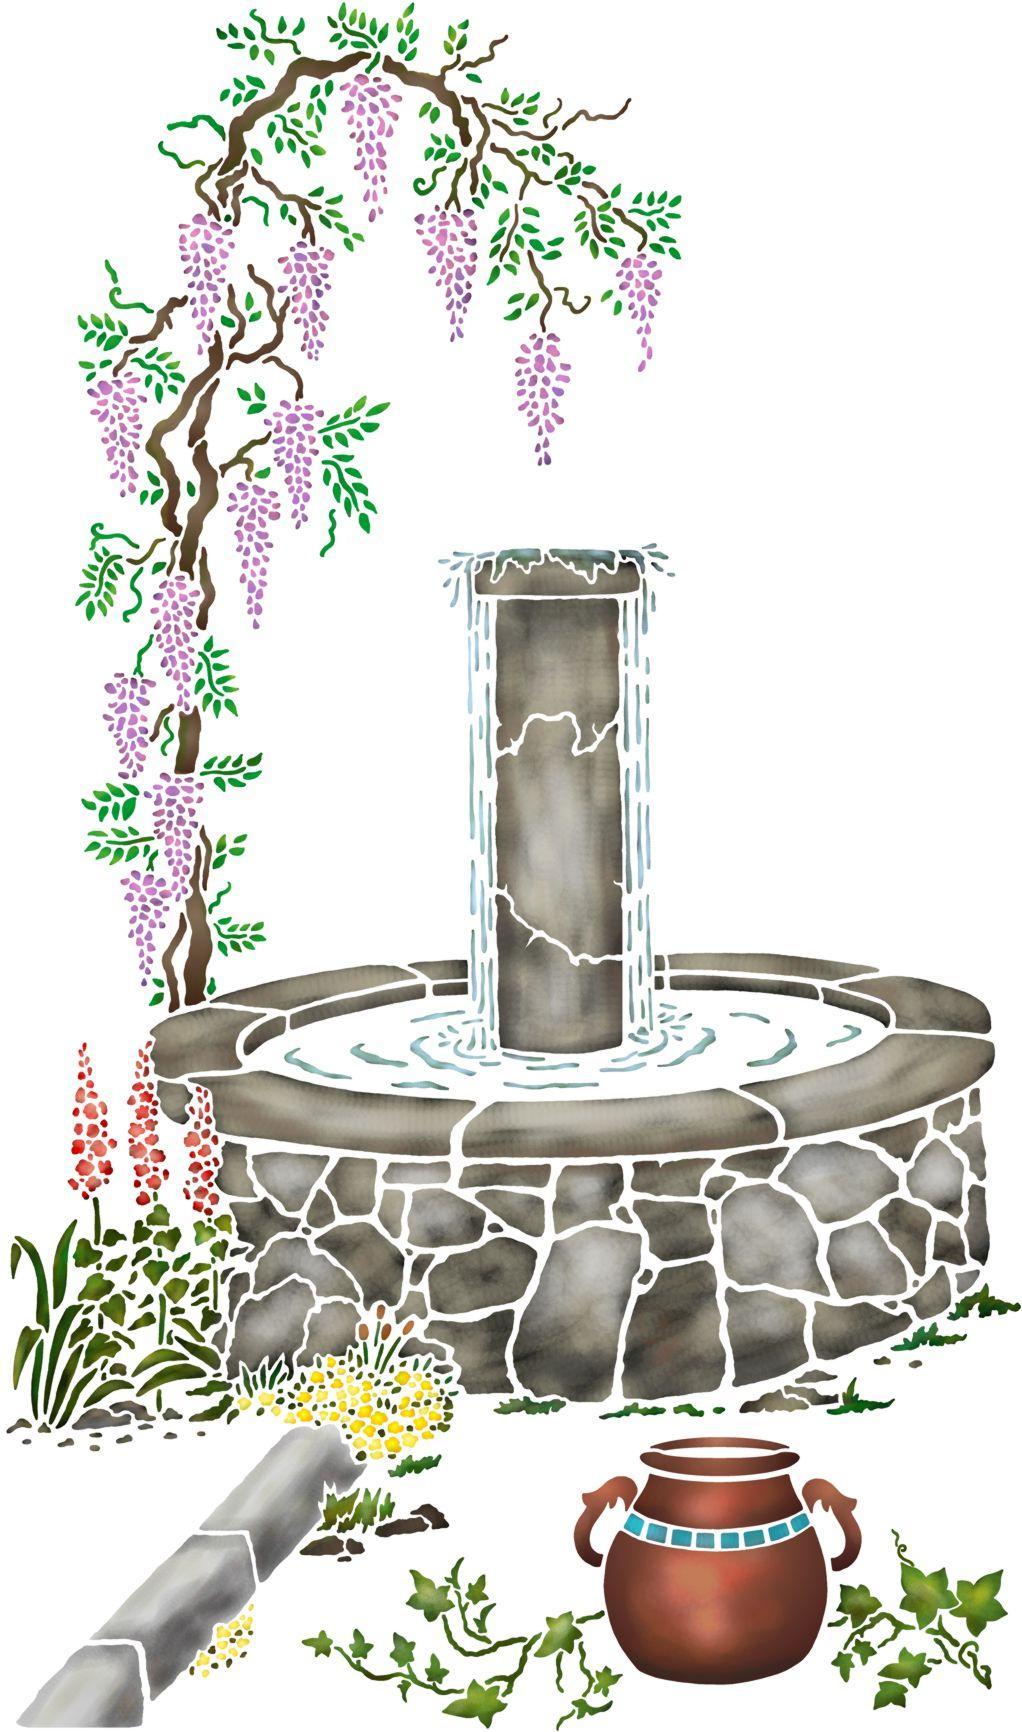 Mur5006 glycine fontaine sticker